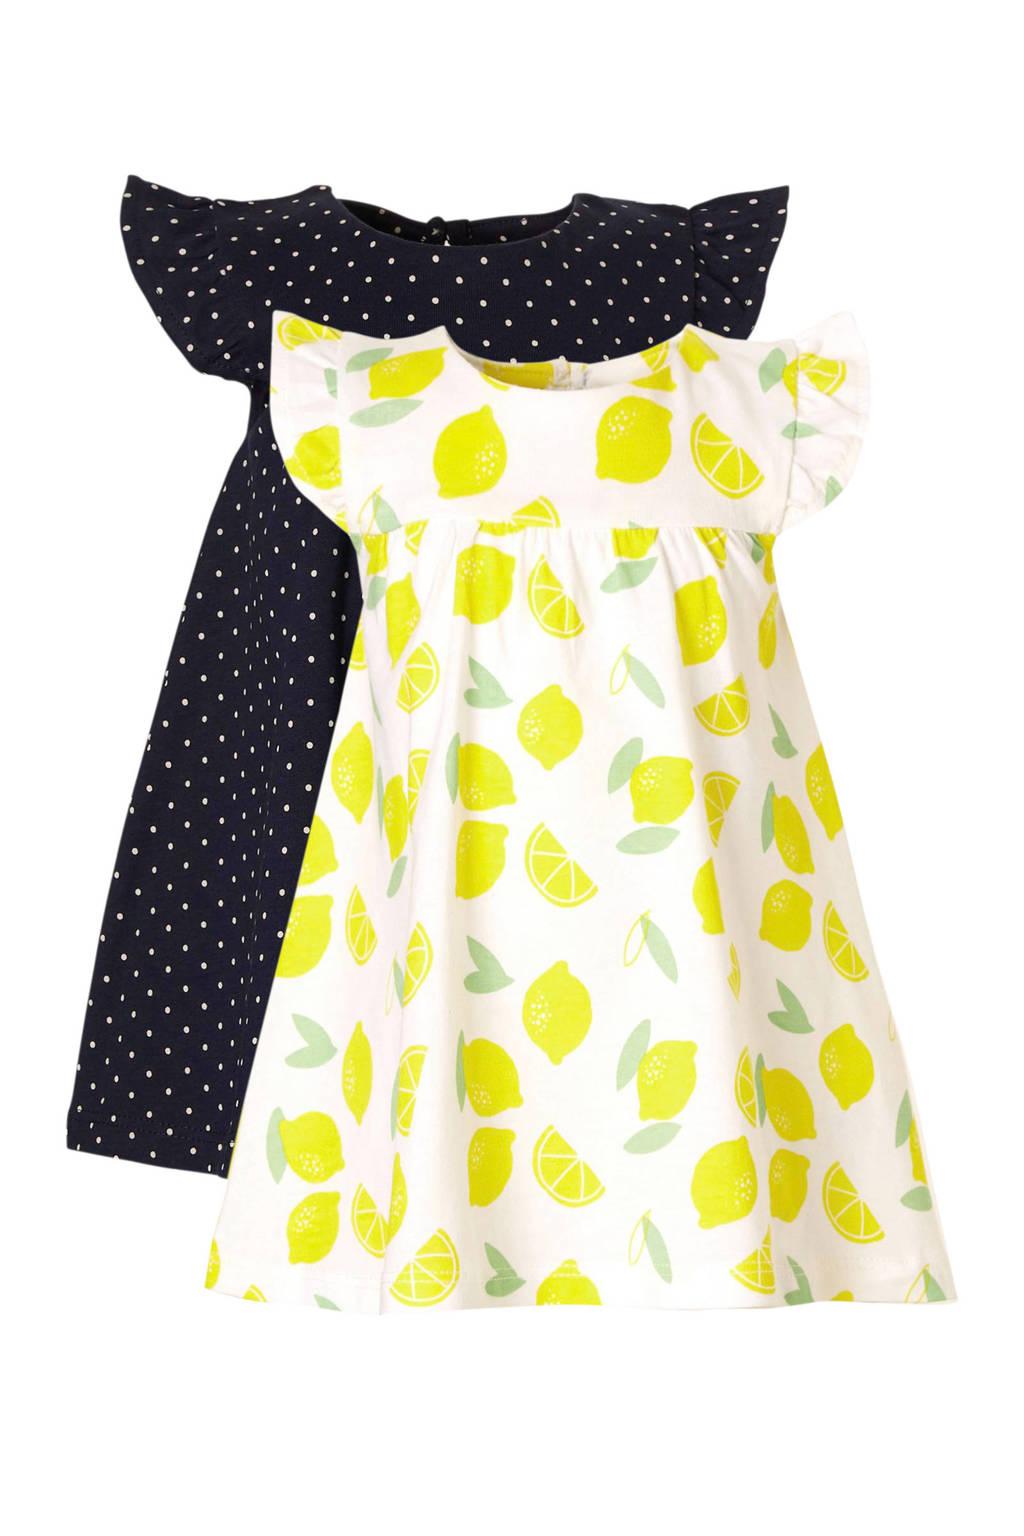 C&A Baby Club jurk - set van 2, Wit/donkerblauw